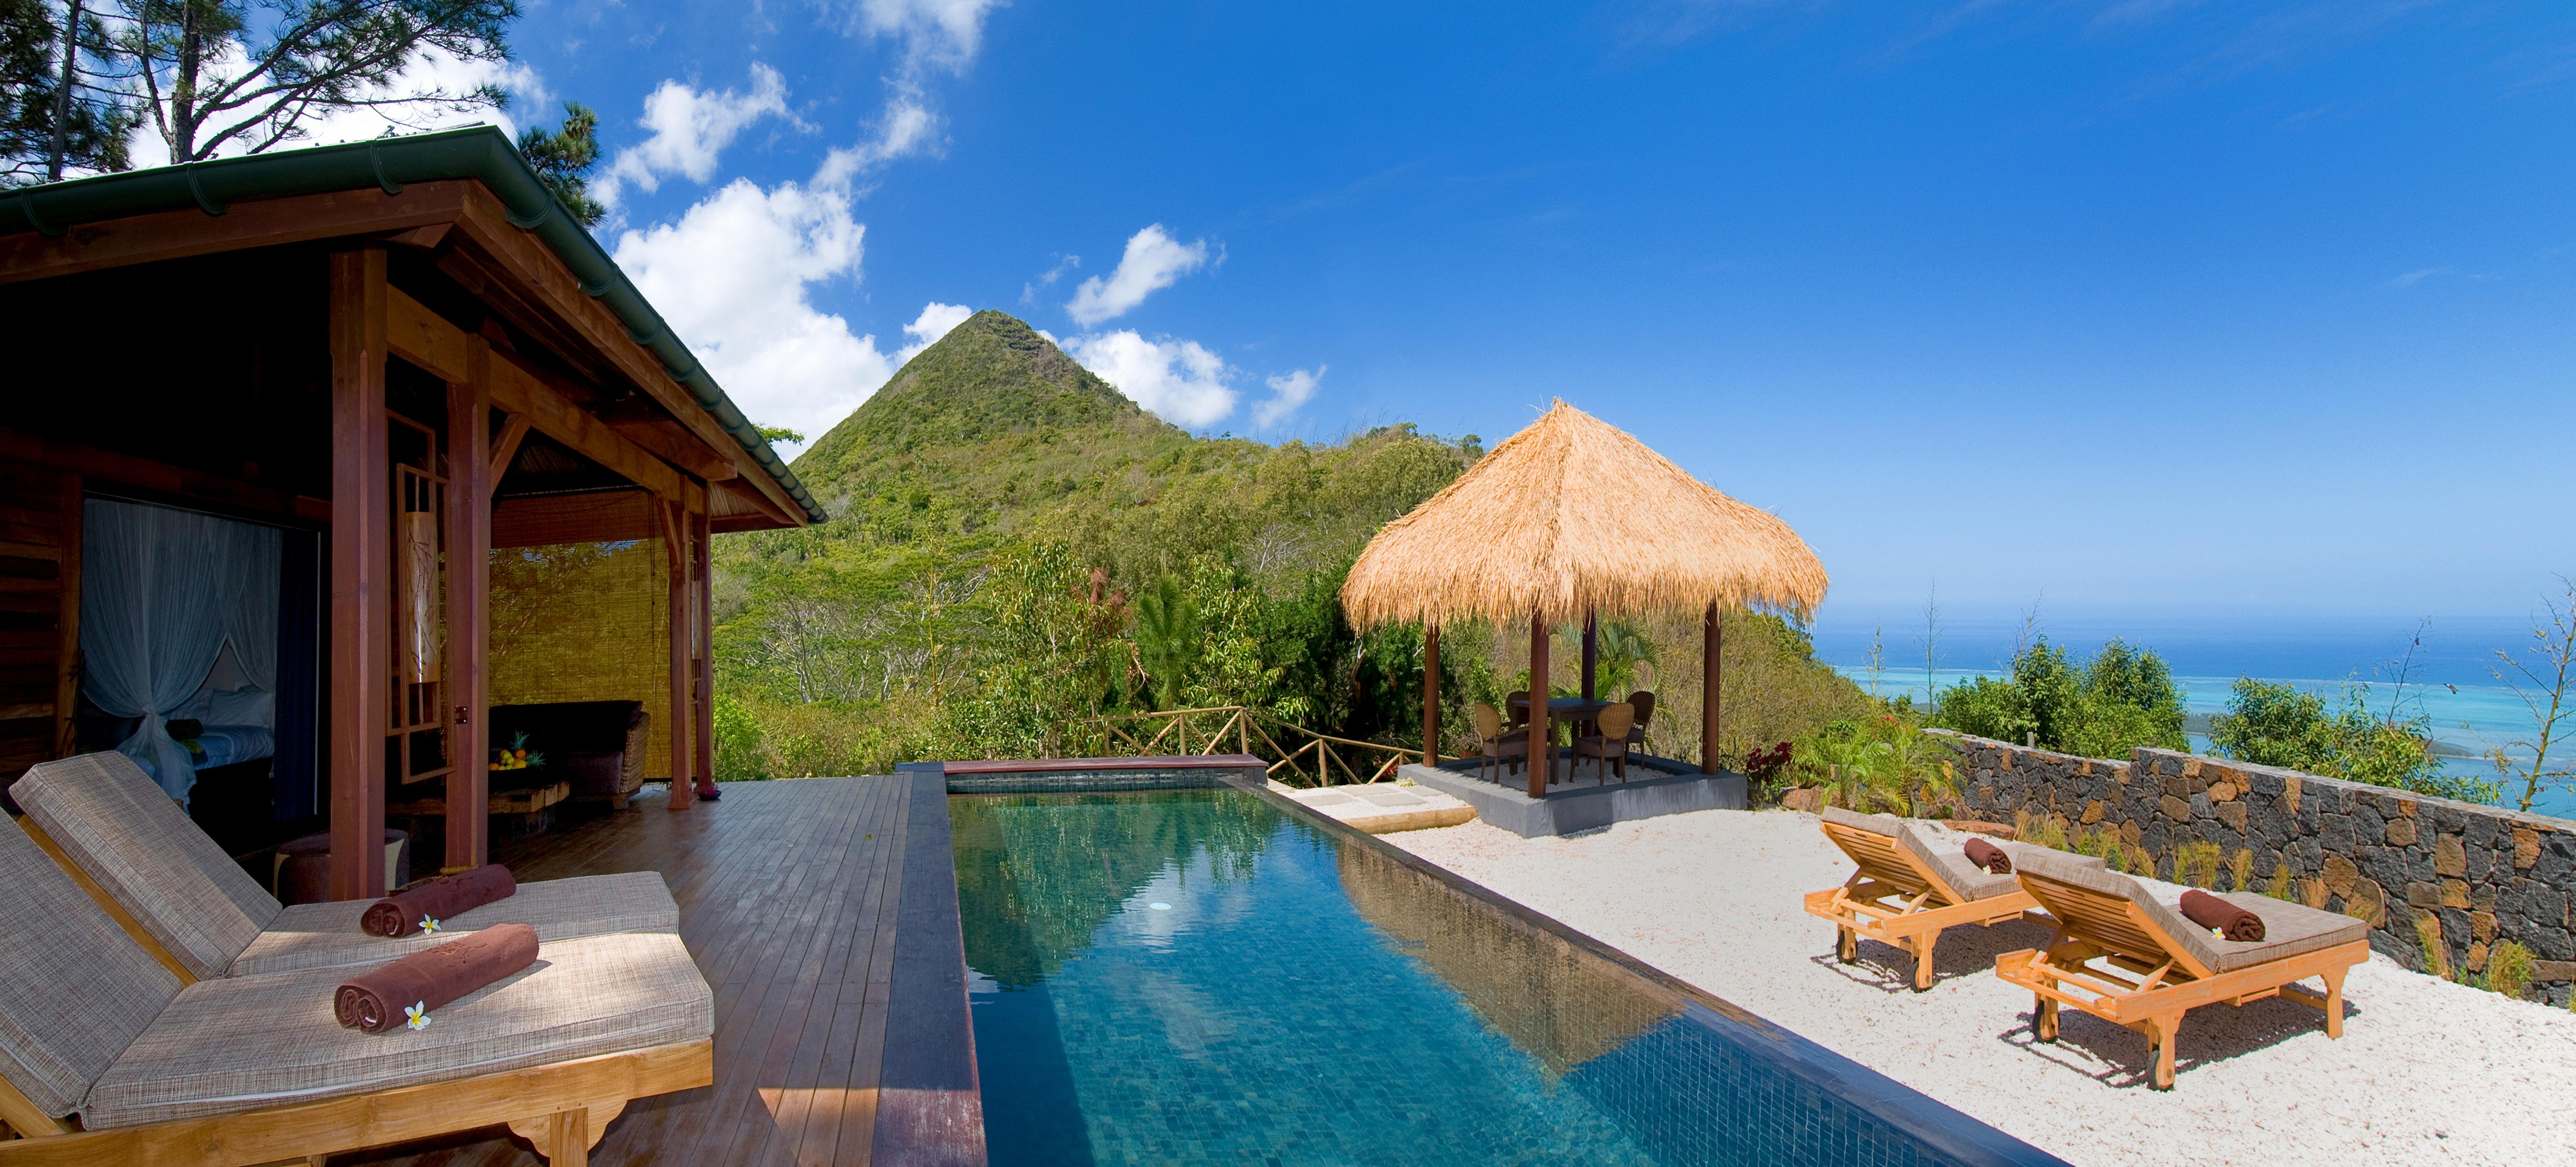 Seaview-Suite-Piton-Canot-Lakaz-Chamarel-Exclusive-Lodge-Mauritius